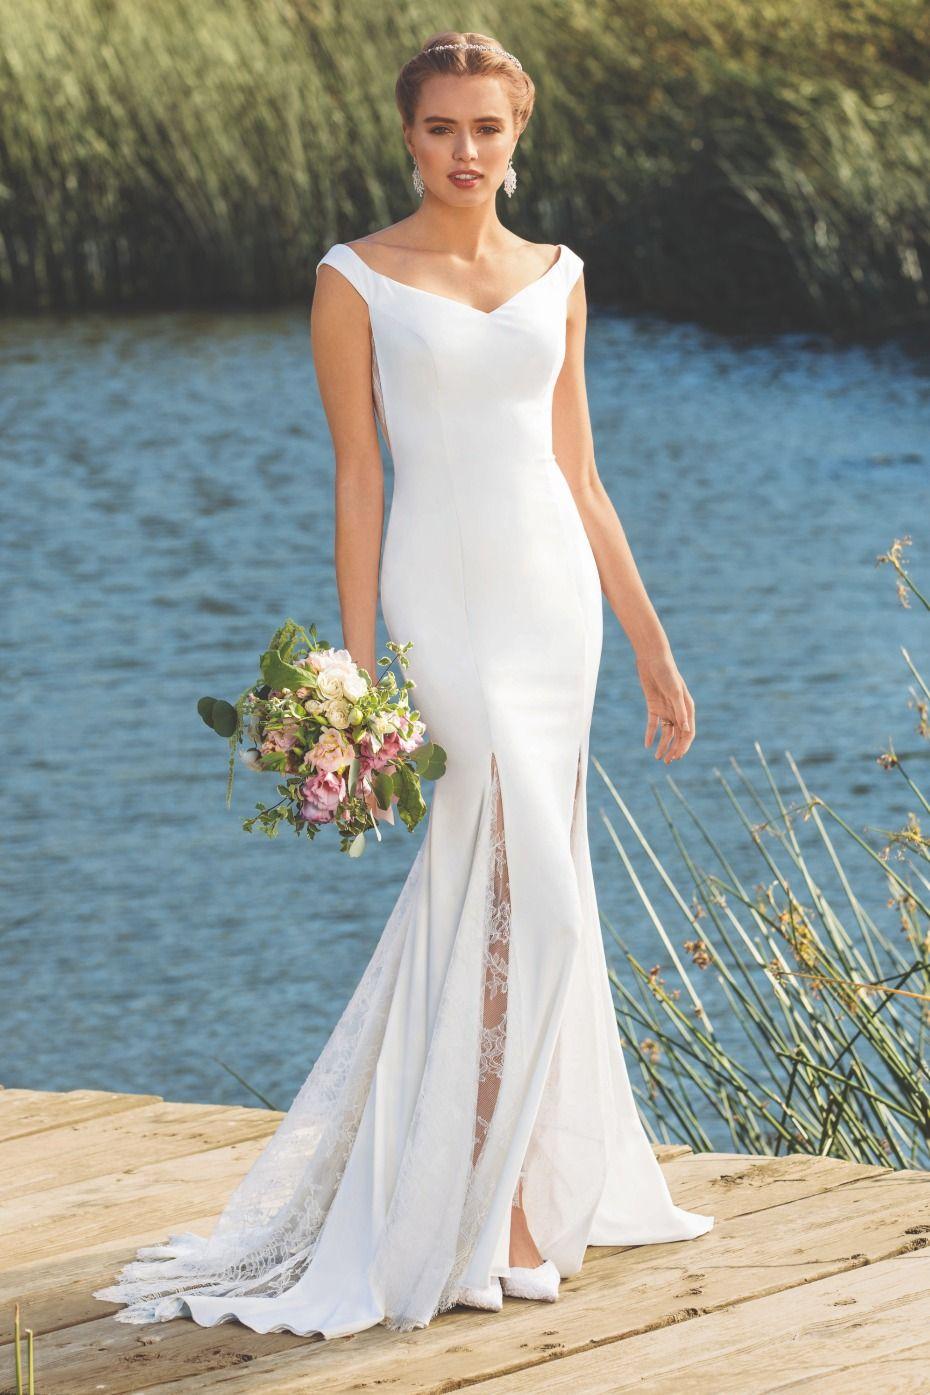 5 BudgetFriendly Dresses from Beloved Casablanca Bridal